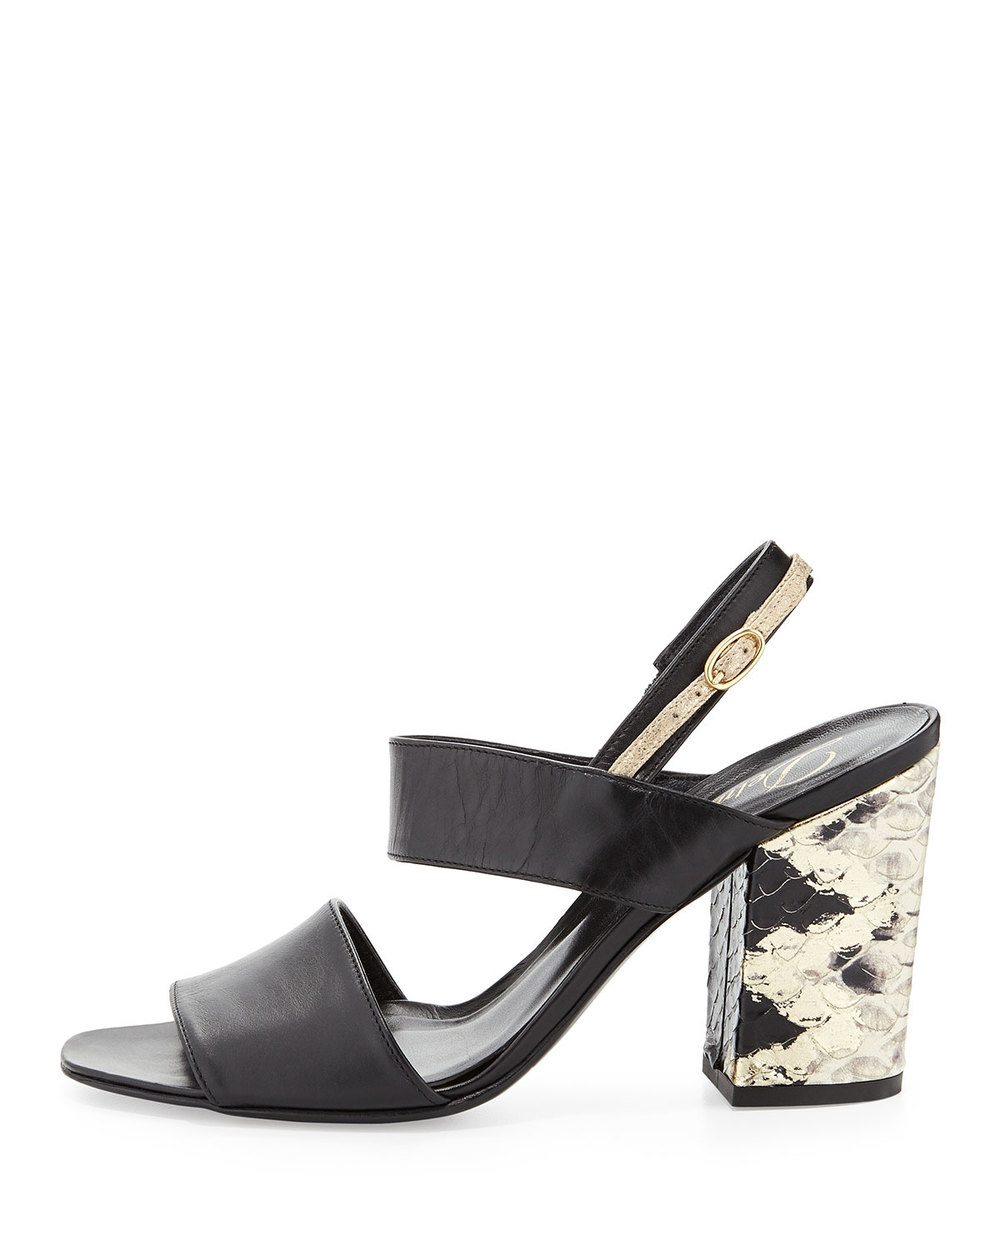 Snake-embossed block heels > non-snake-embossed block heels. Delman block-heel sandals, $202, at  Neiman Marcus .